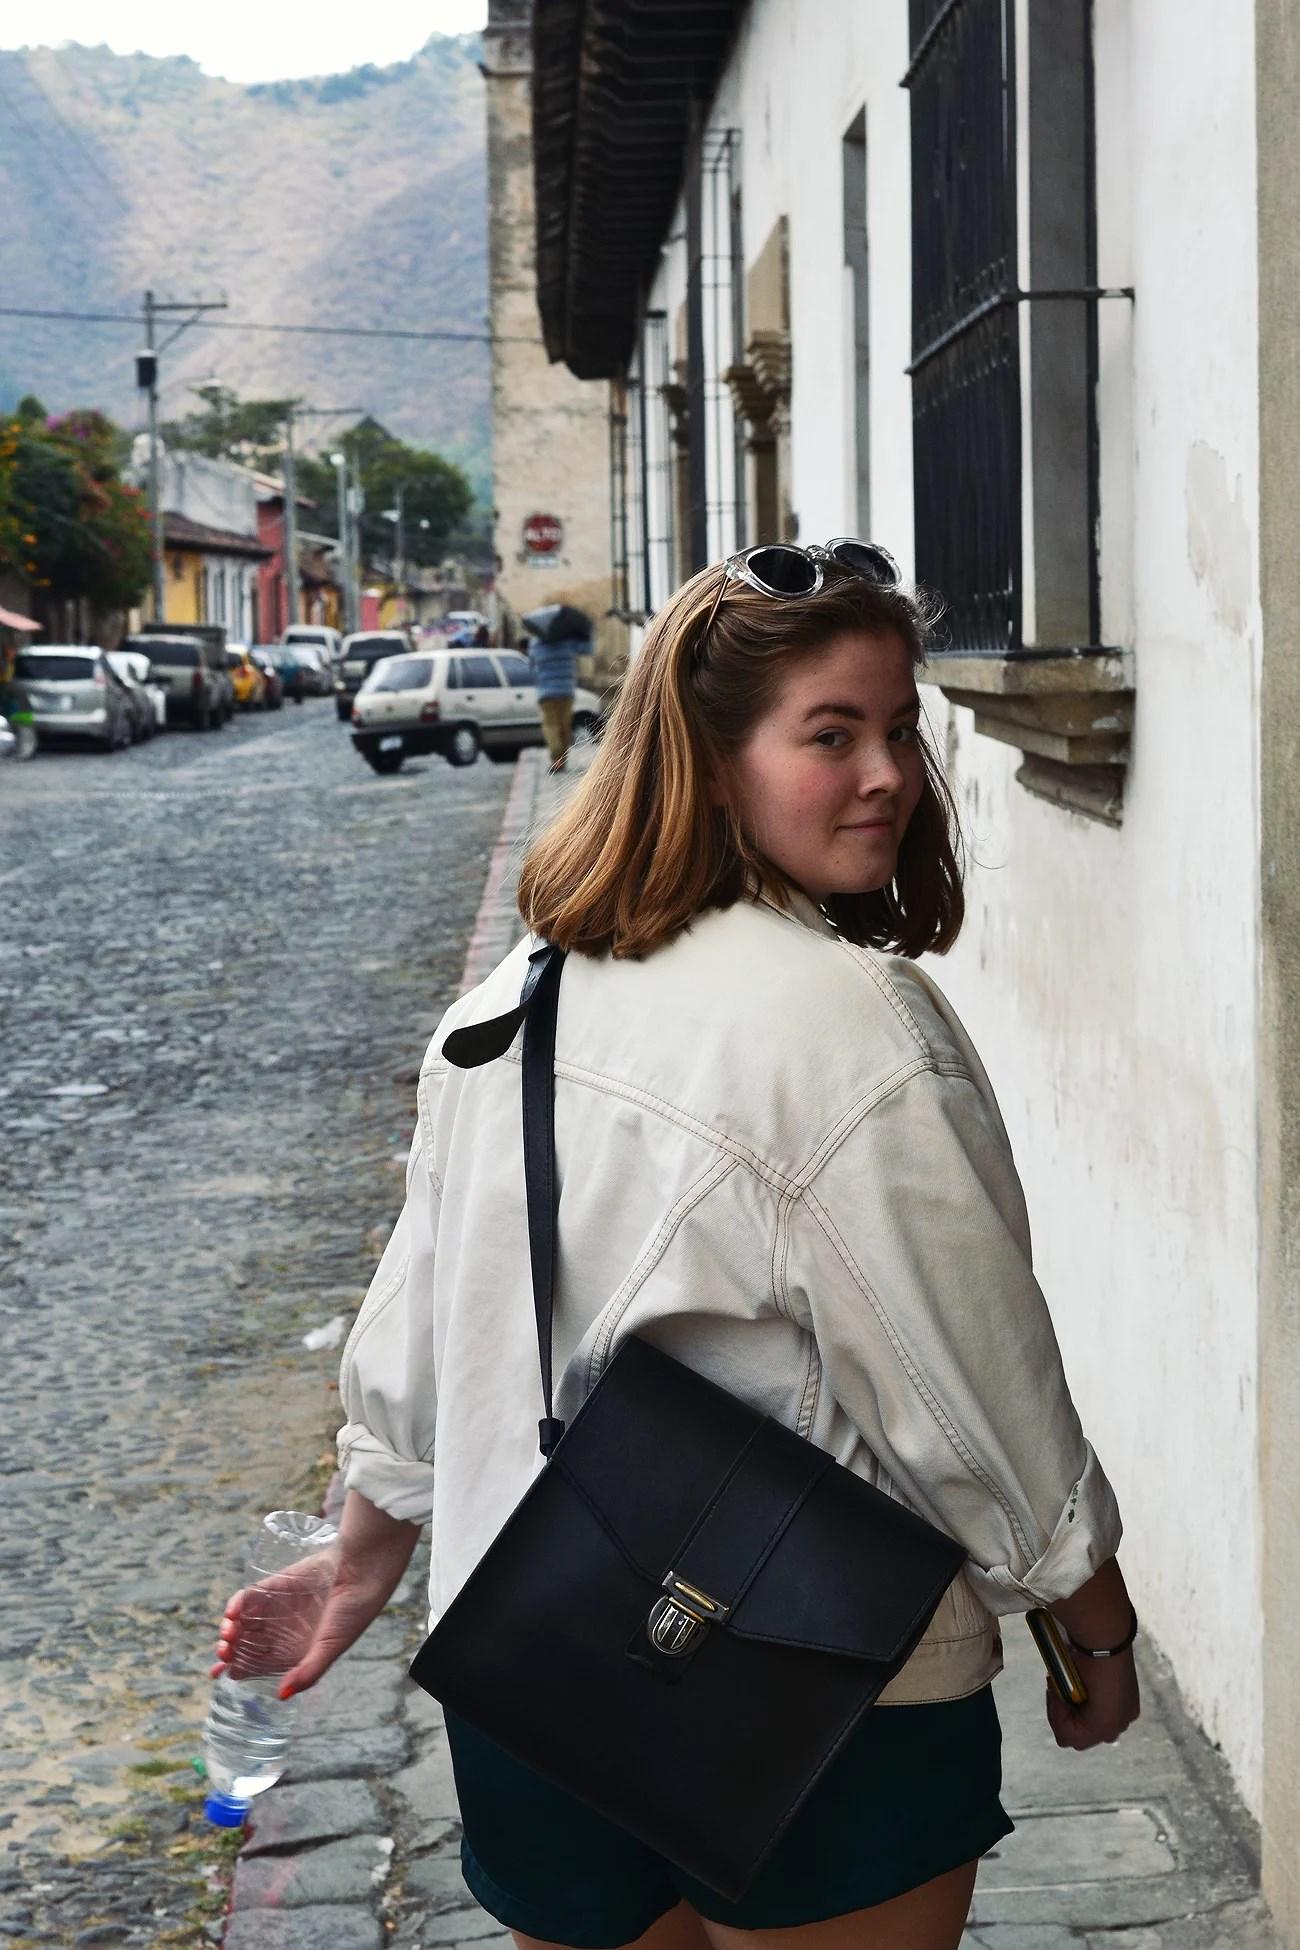 2 years since Guatemala